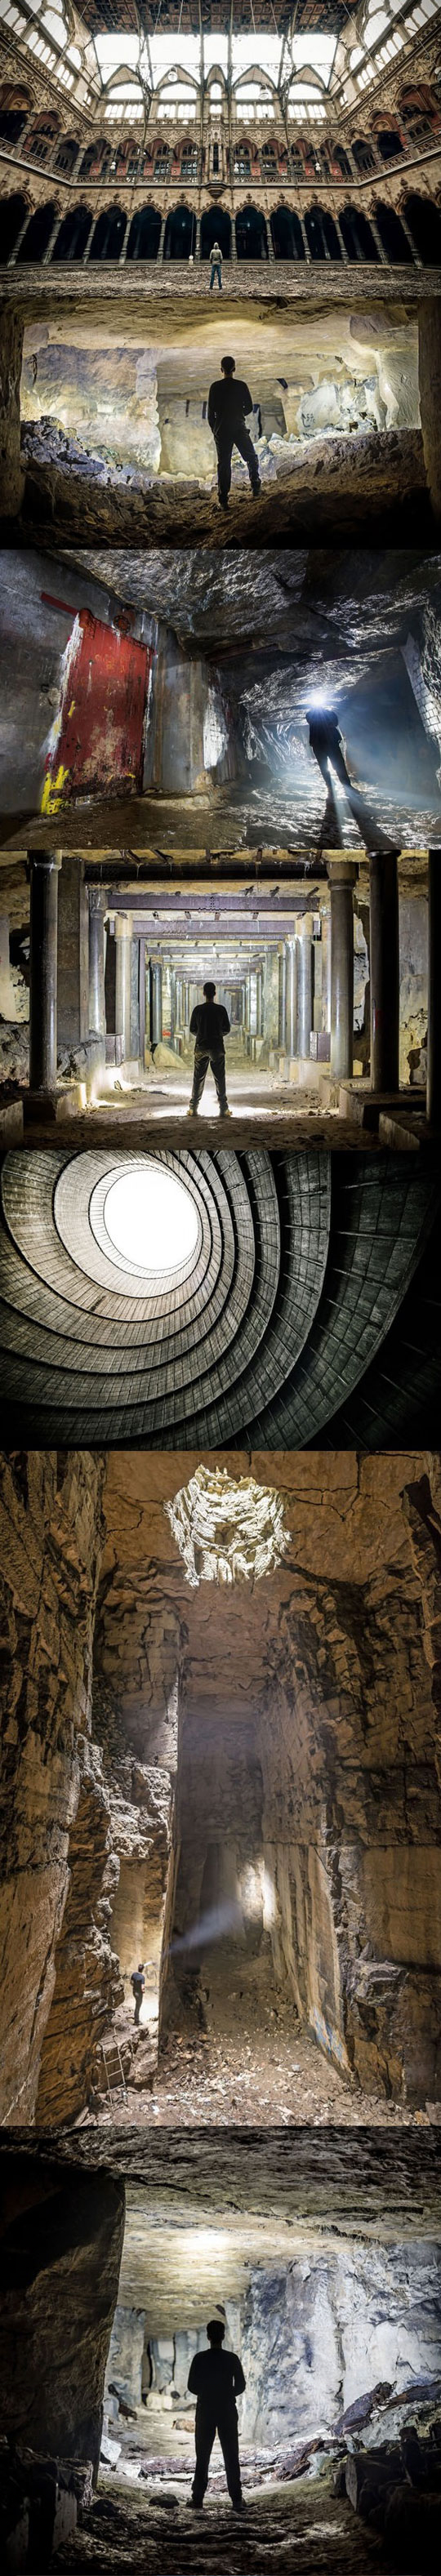 cool-Britain-underground-wonders-photos-building